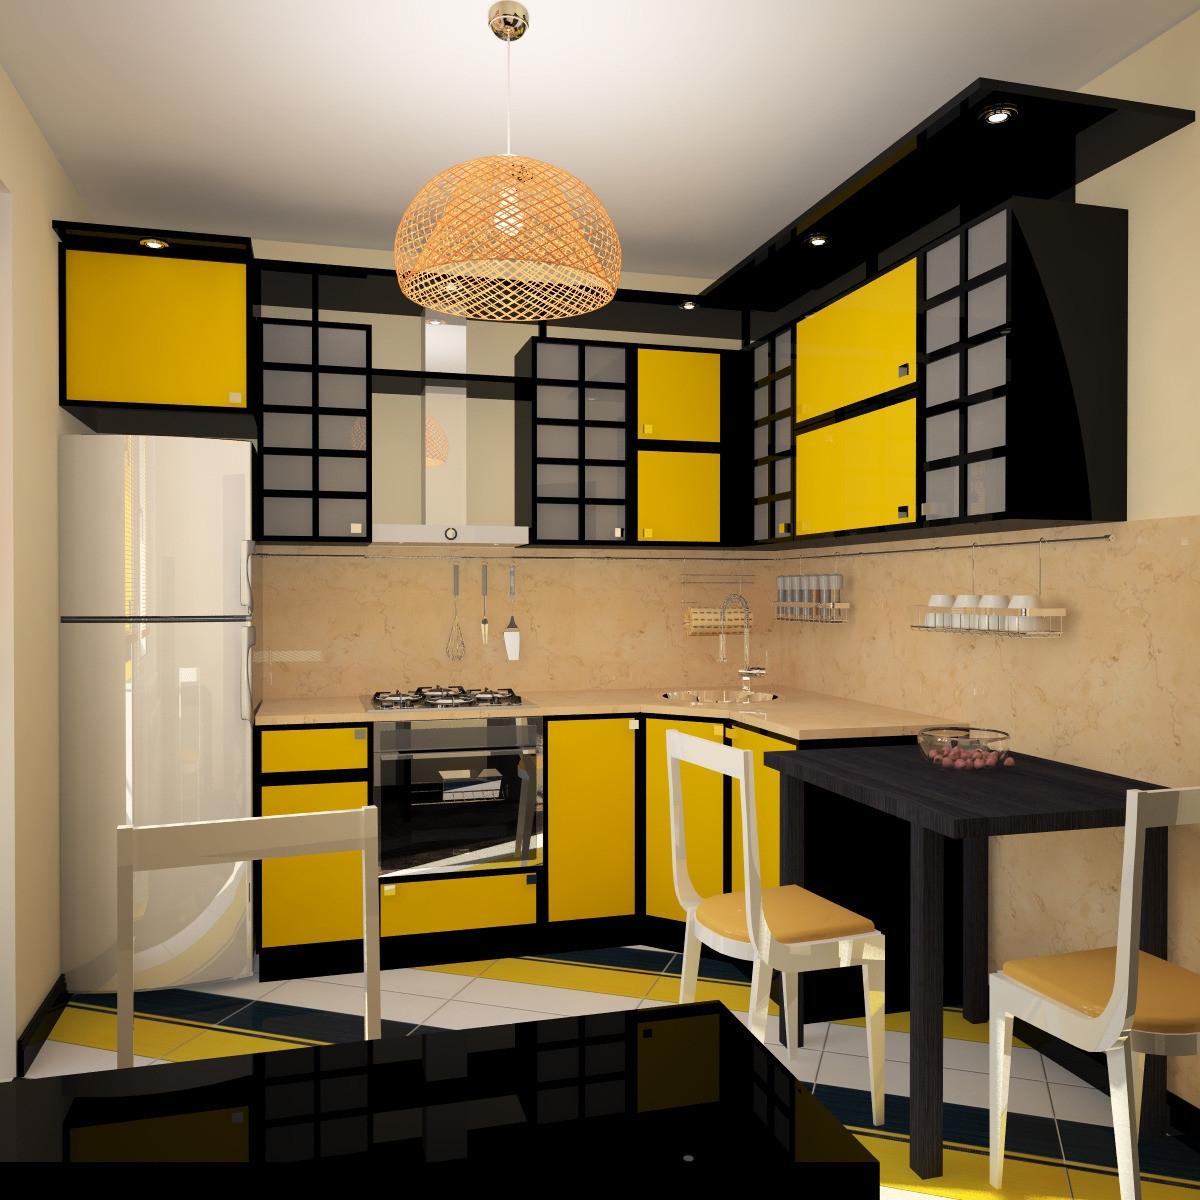 дизайн кухни в японском стиле фото пример